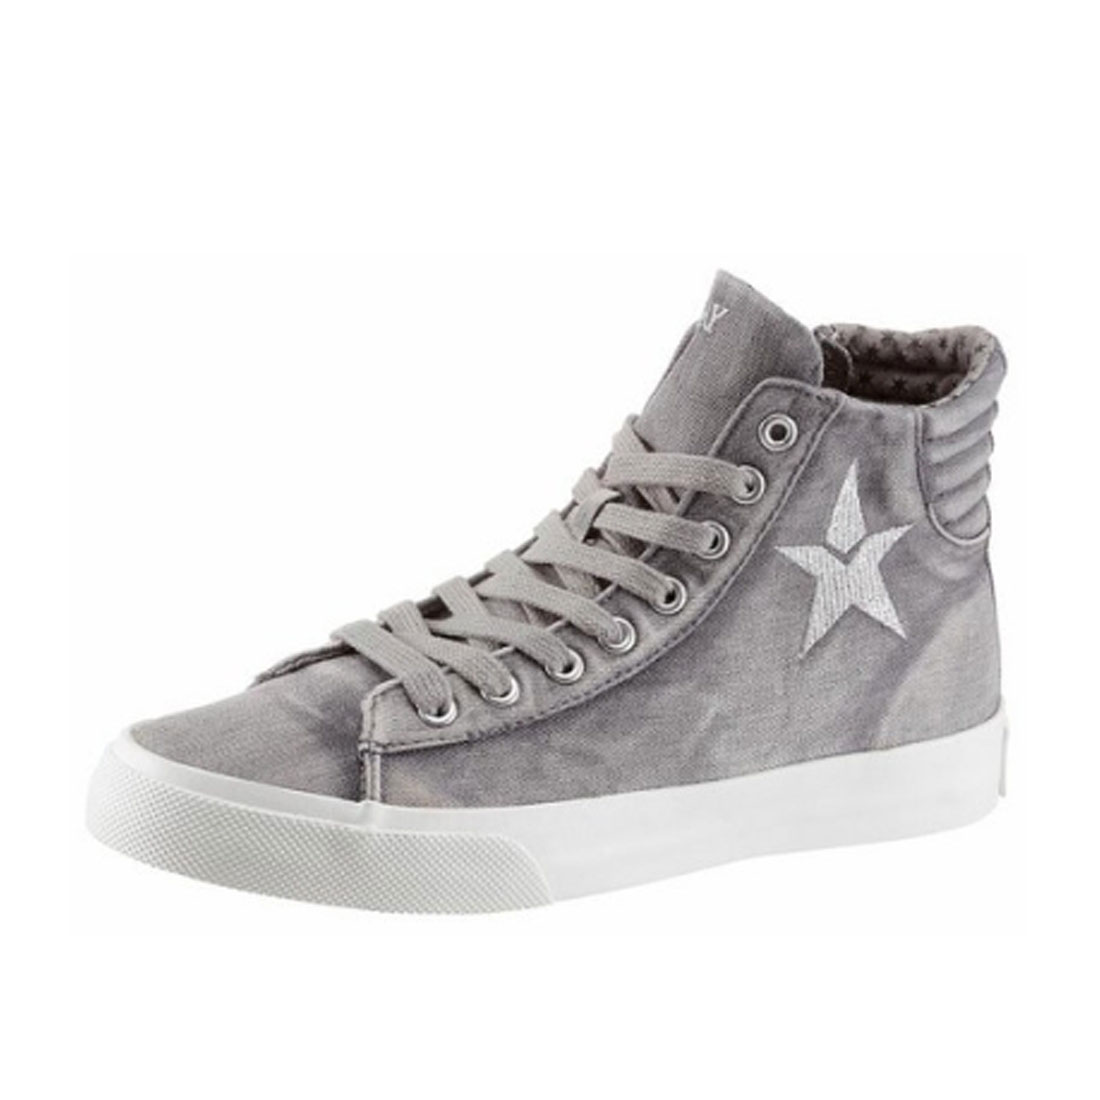 Replay Damen Sneaker EDNA HI Top Schuhe Jeans Grau